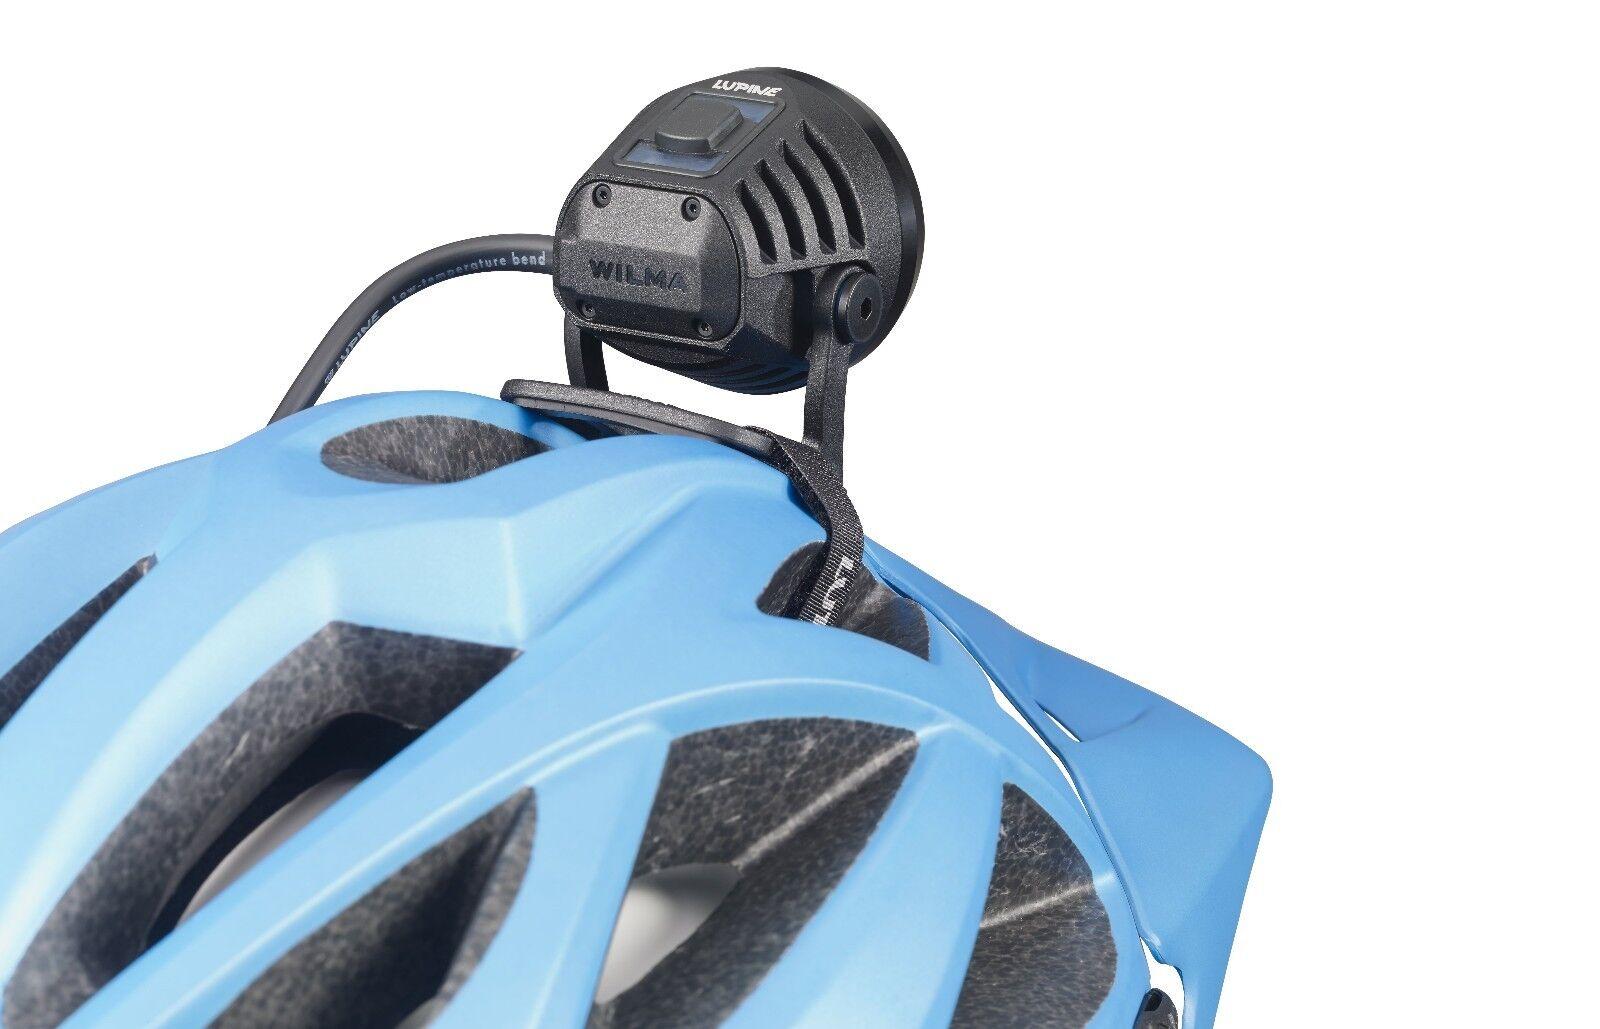 Lupine Wilma 7 Helmet Light System 3200 Lumens Lumens 3200 SmartCore NEW c6e9b6